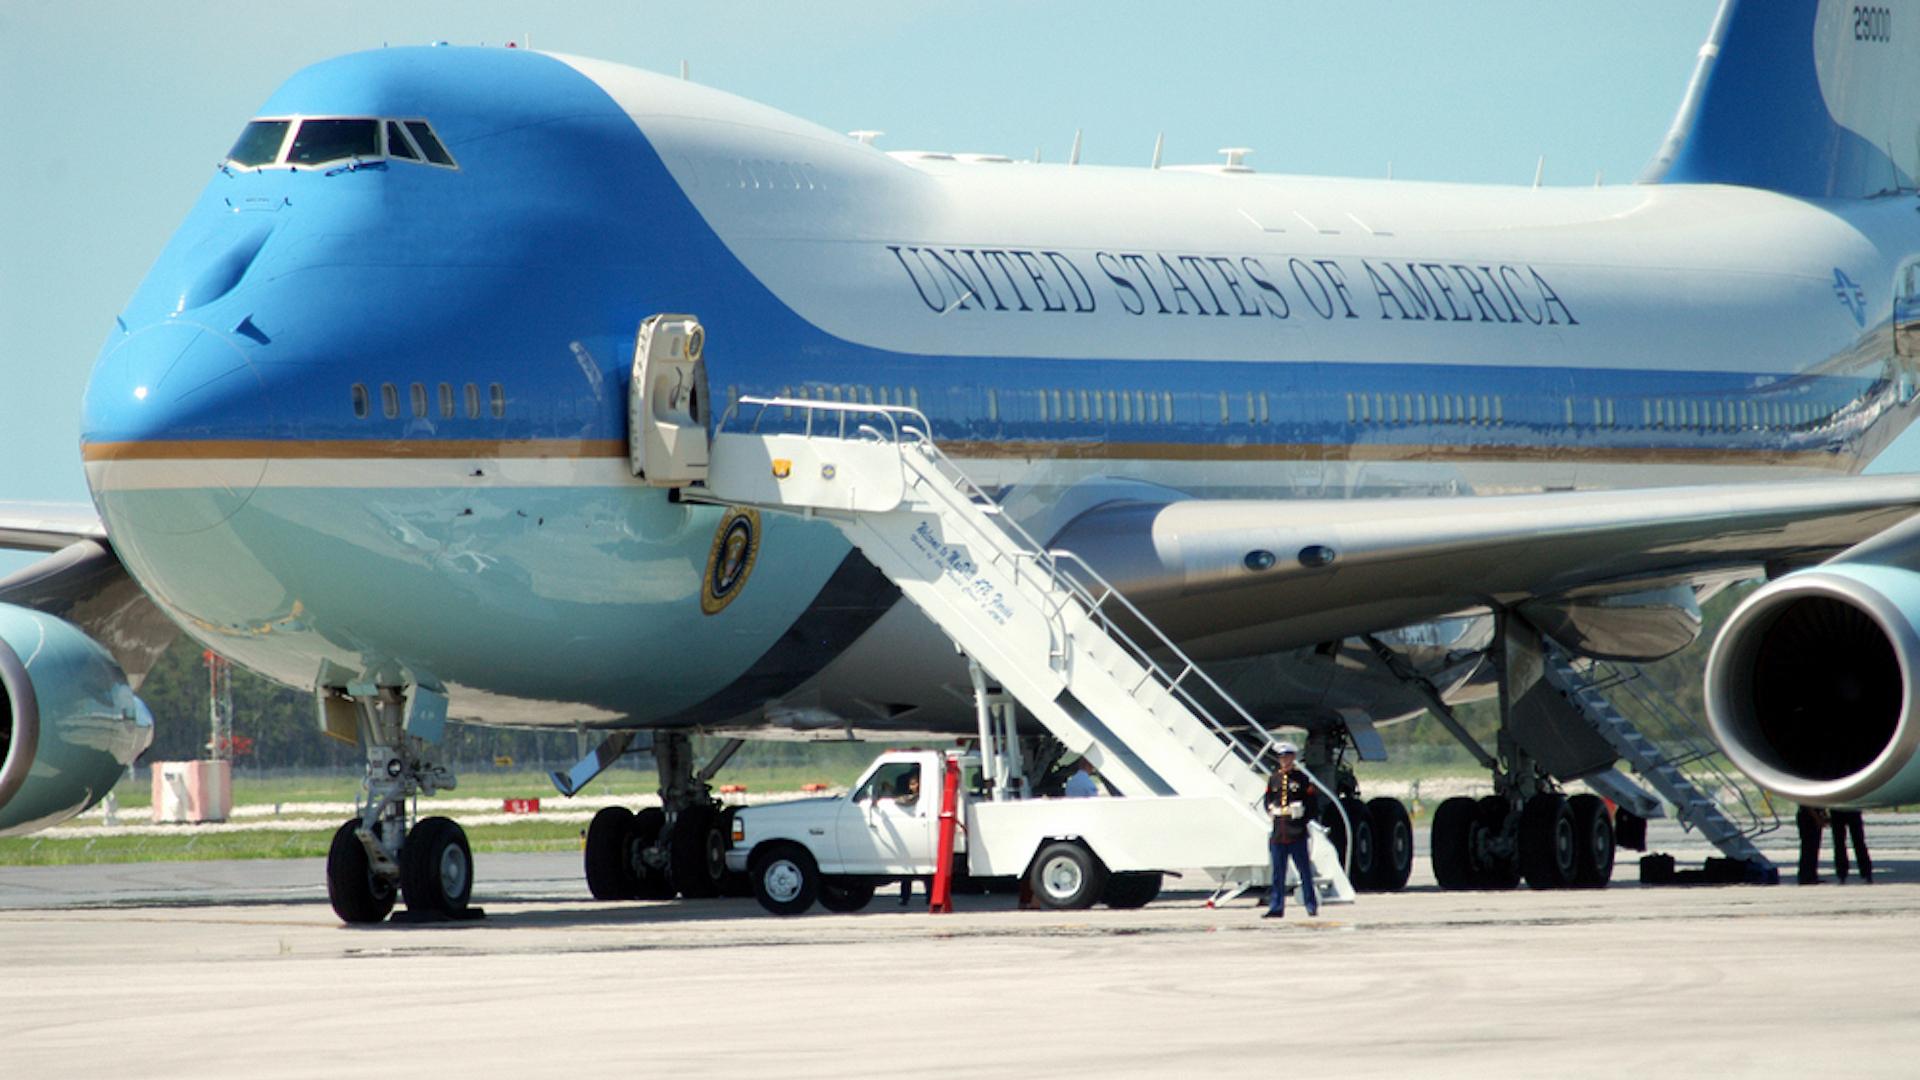 The president's plane